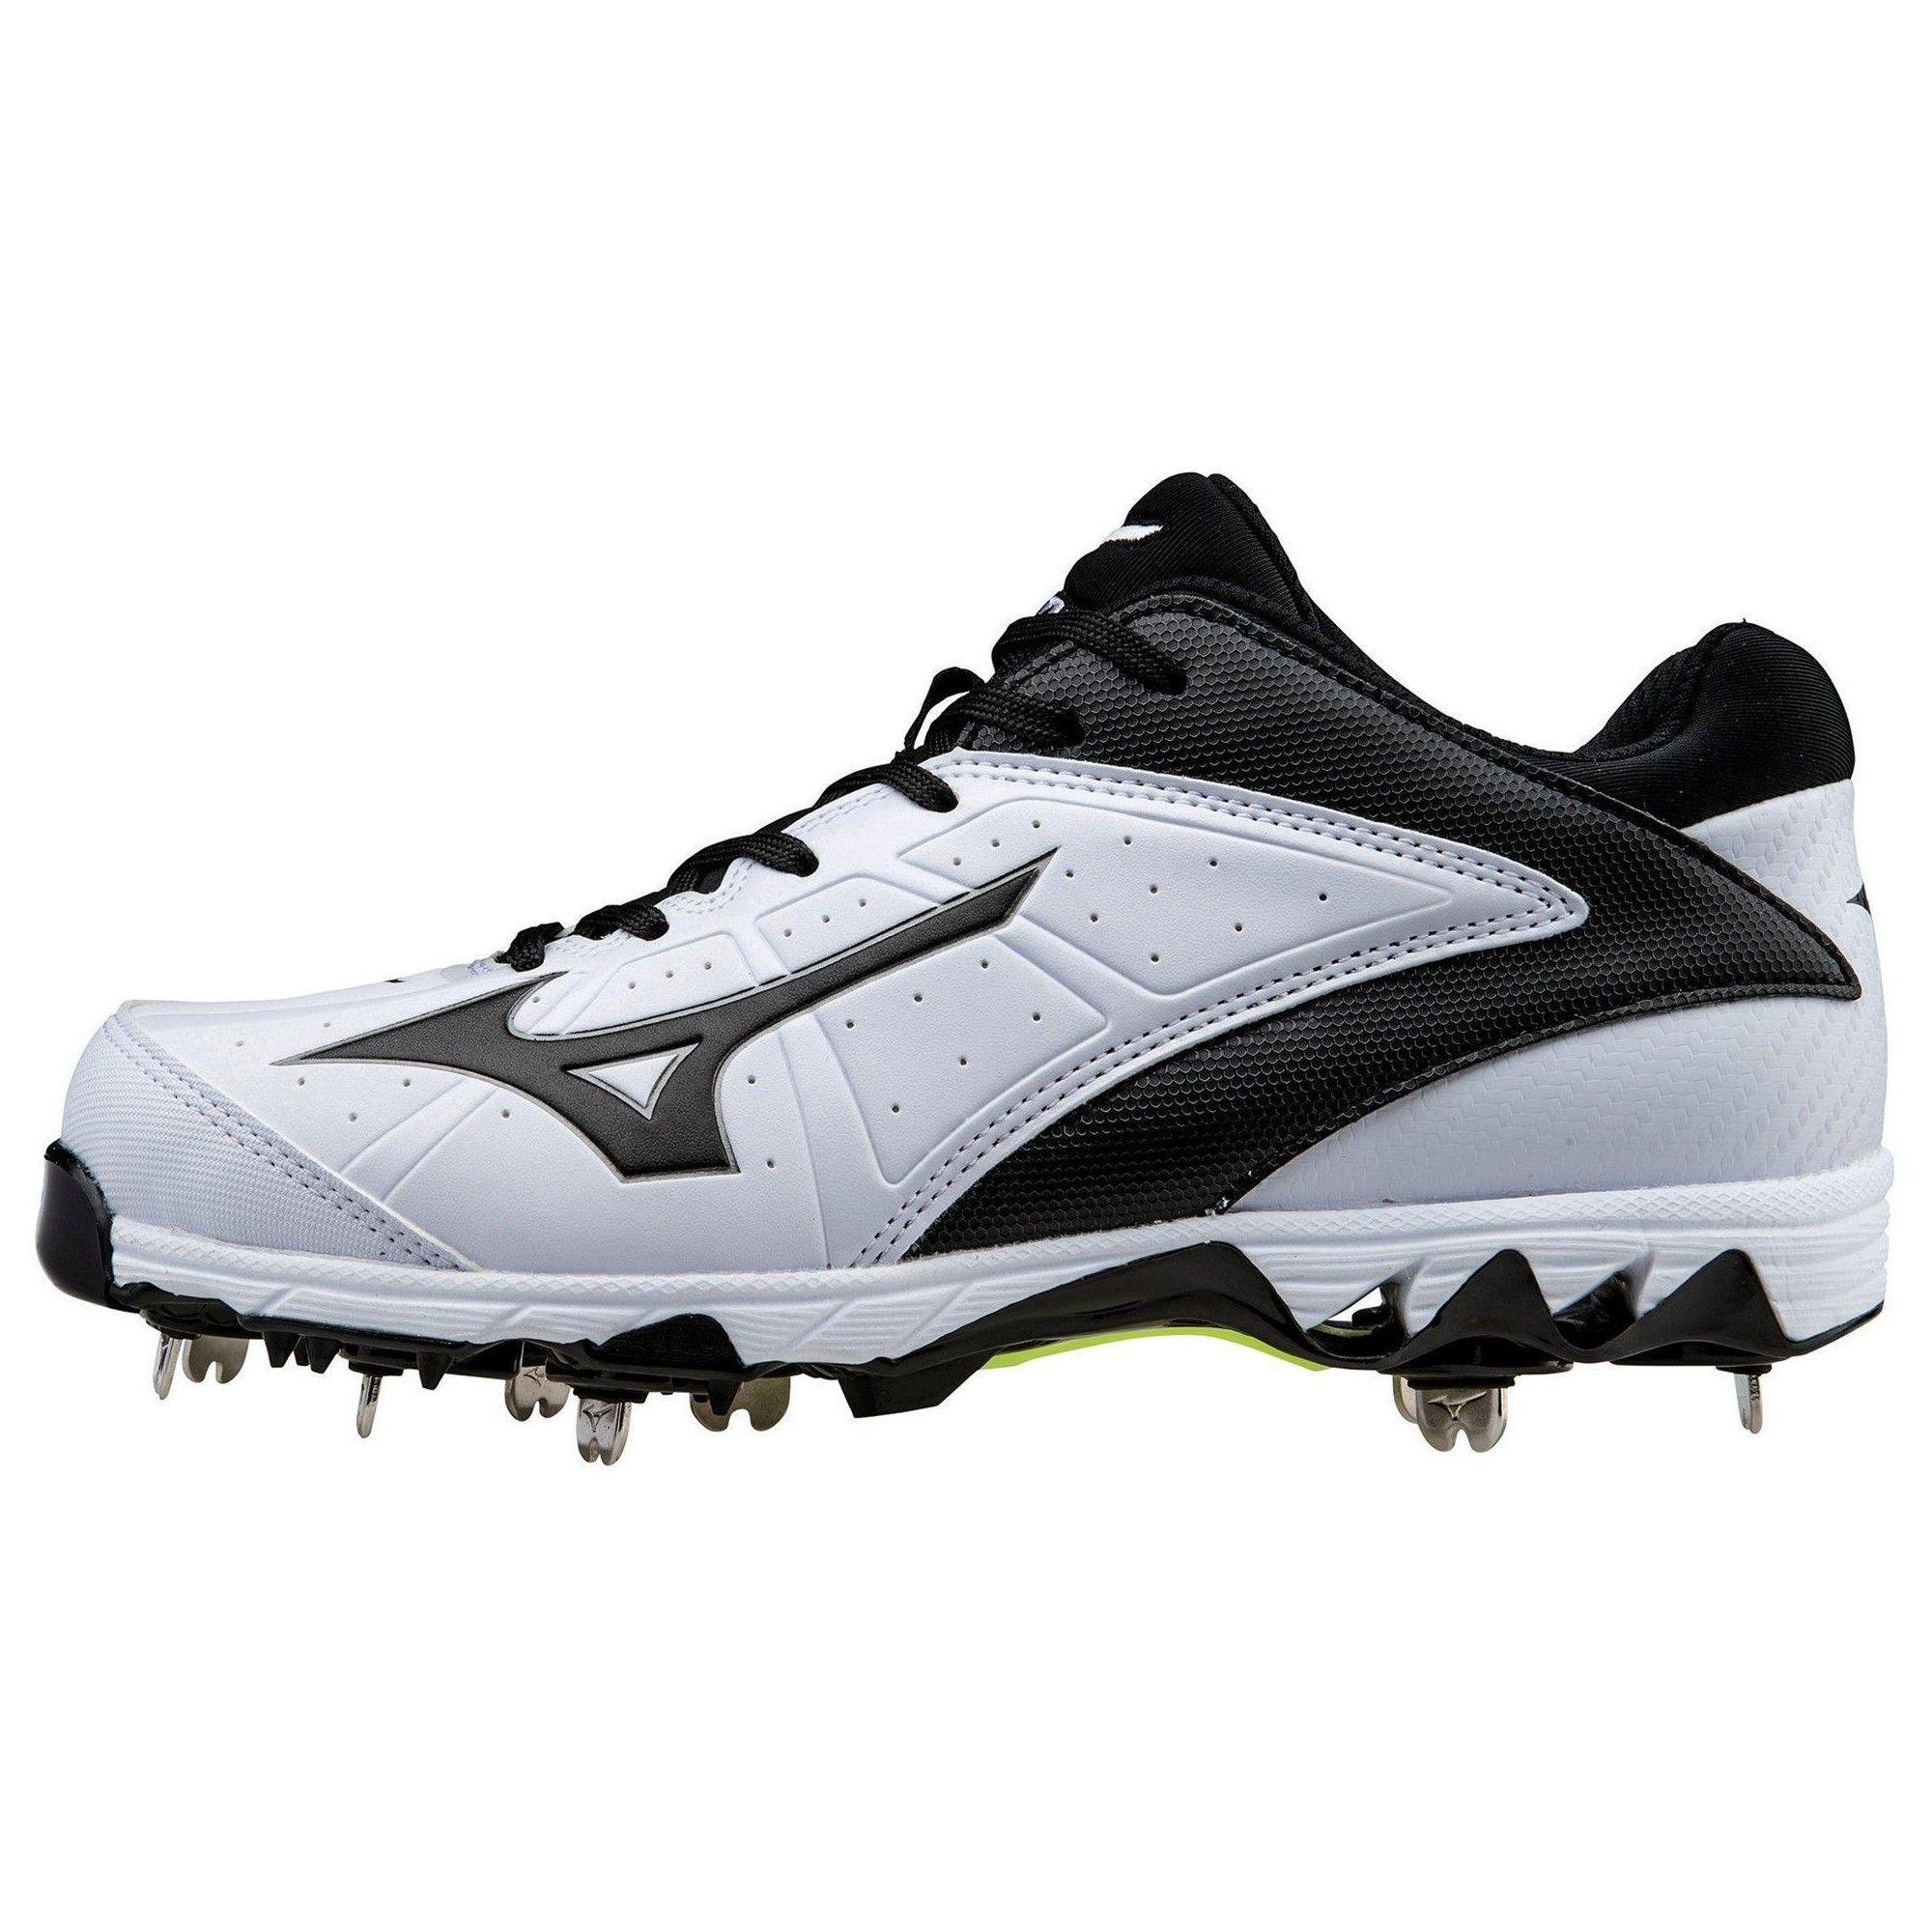 Softball shoes, Metal baseball cleats